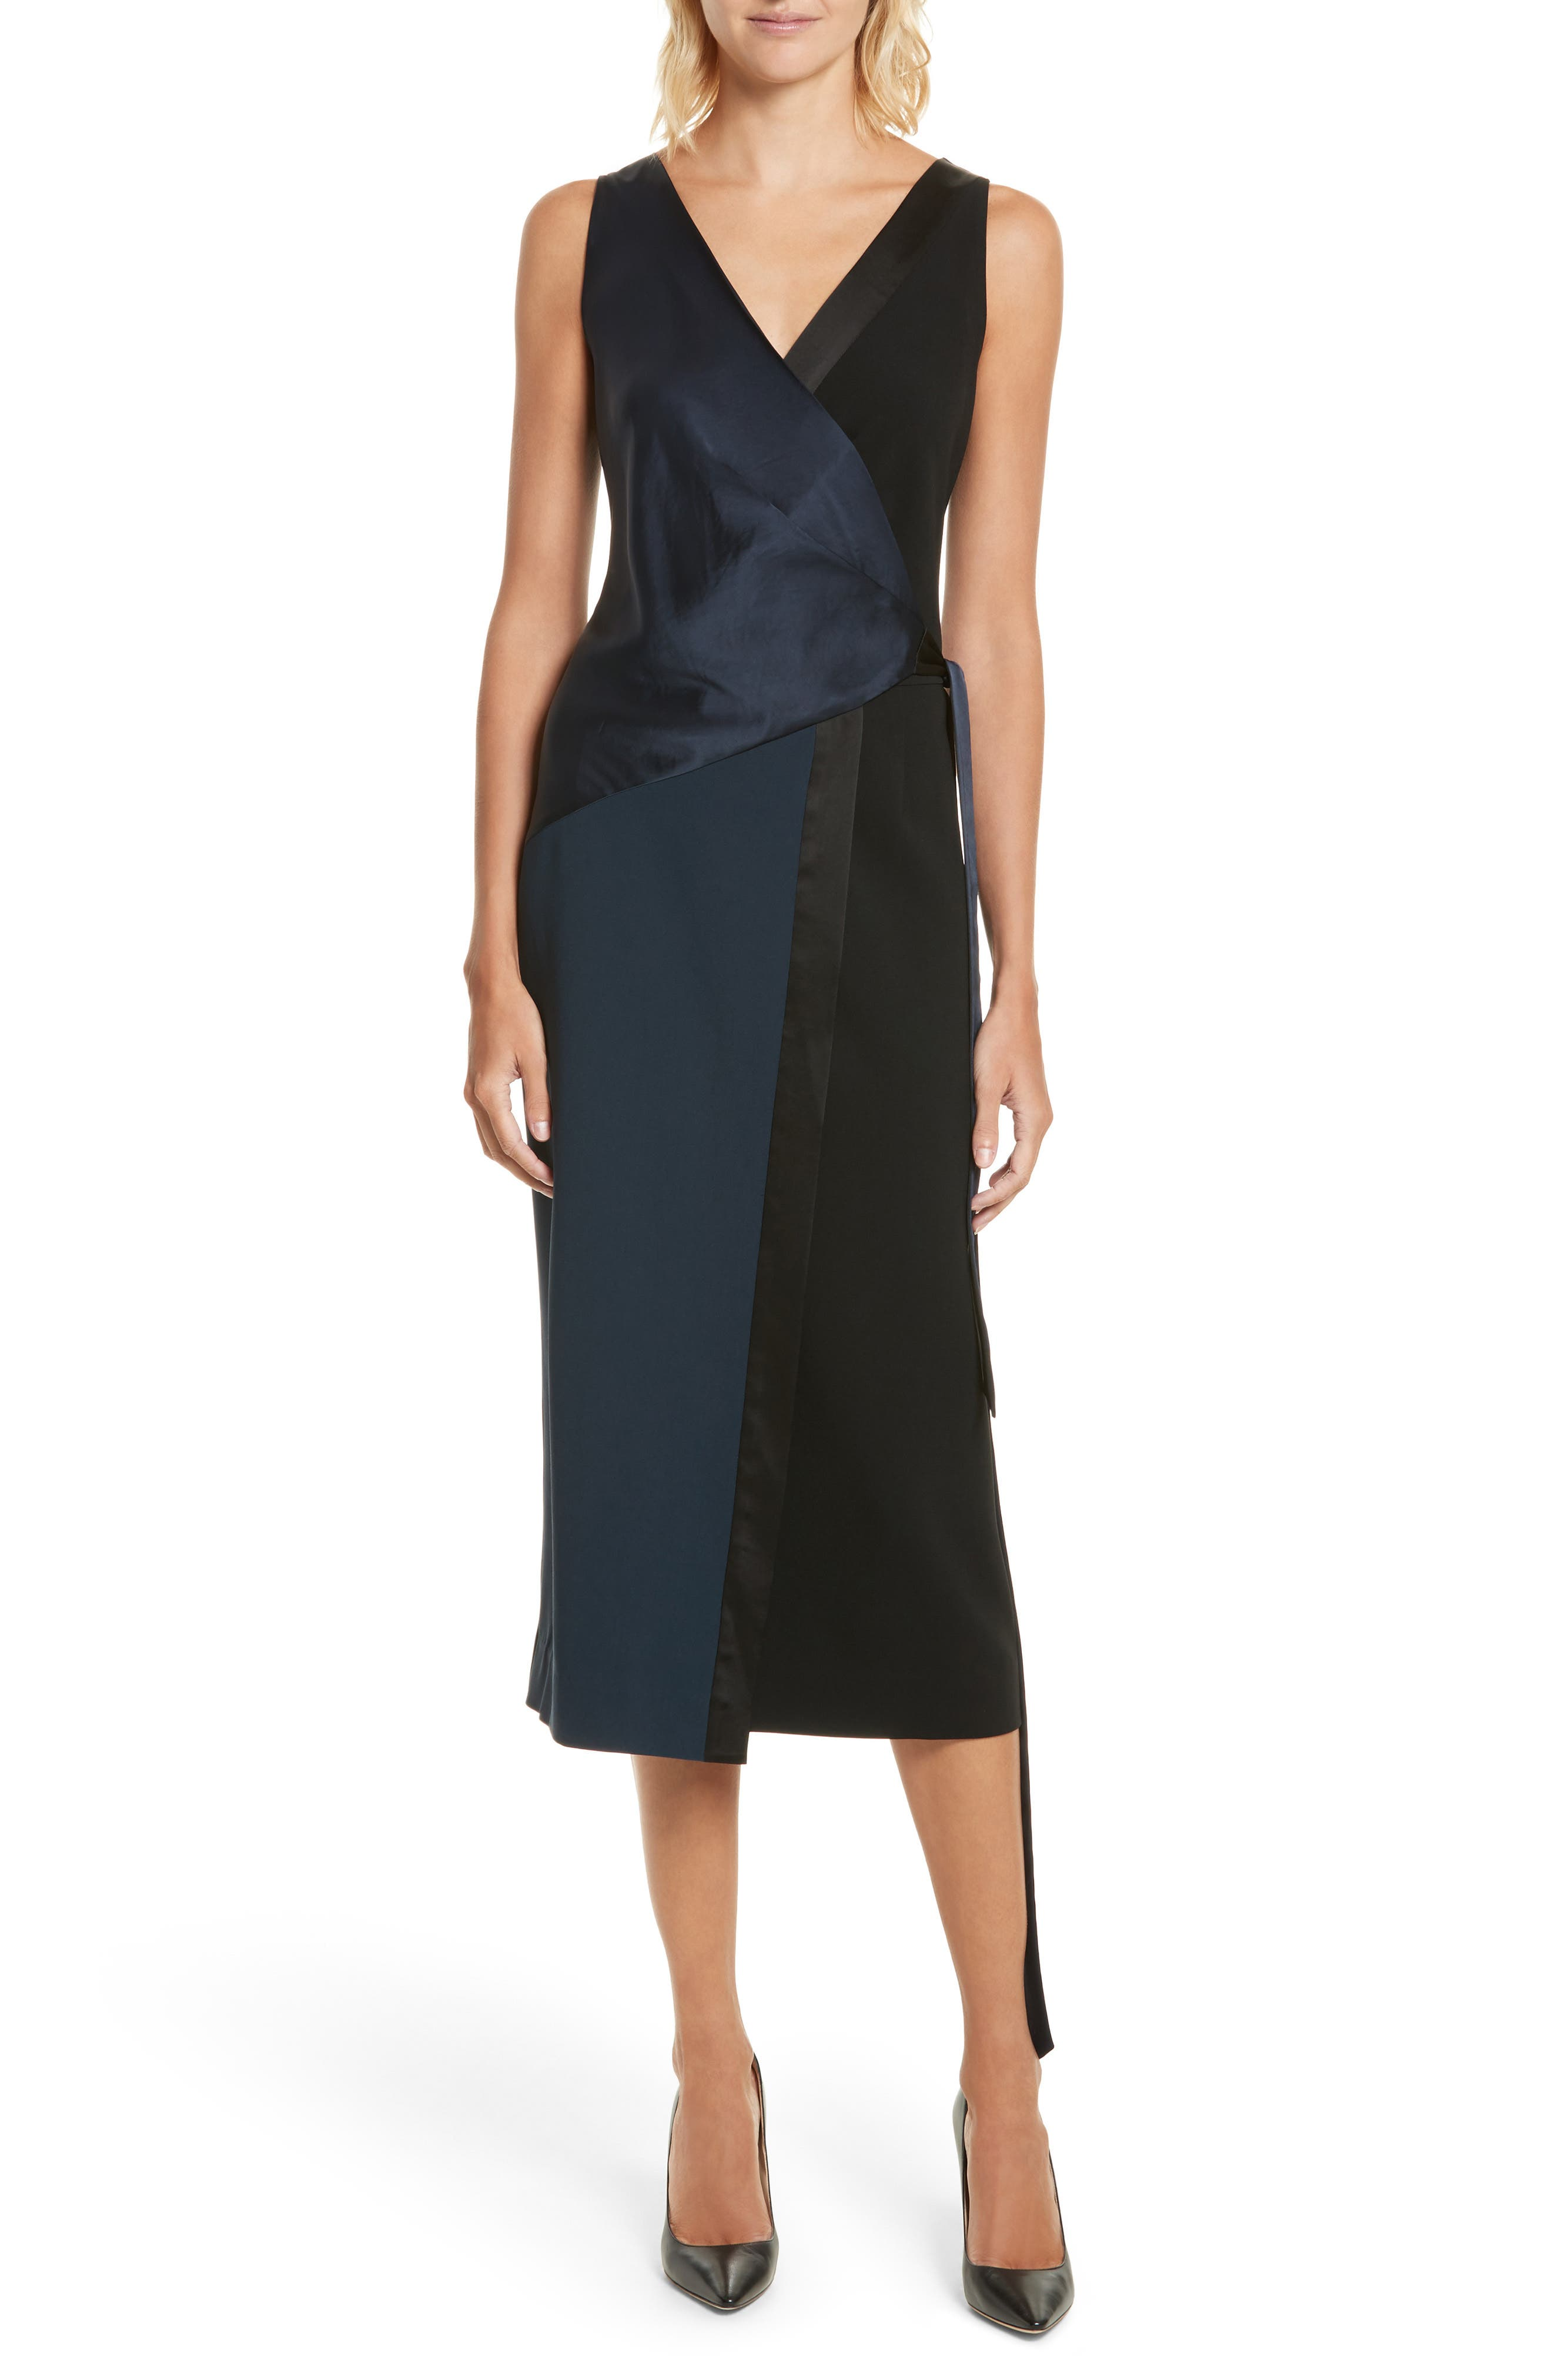 Midi Wrap Dress,                         Main,                         color, Alexander Navy/ Black